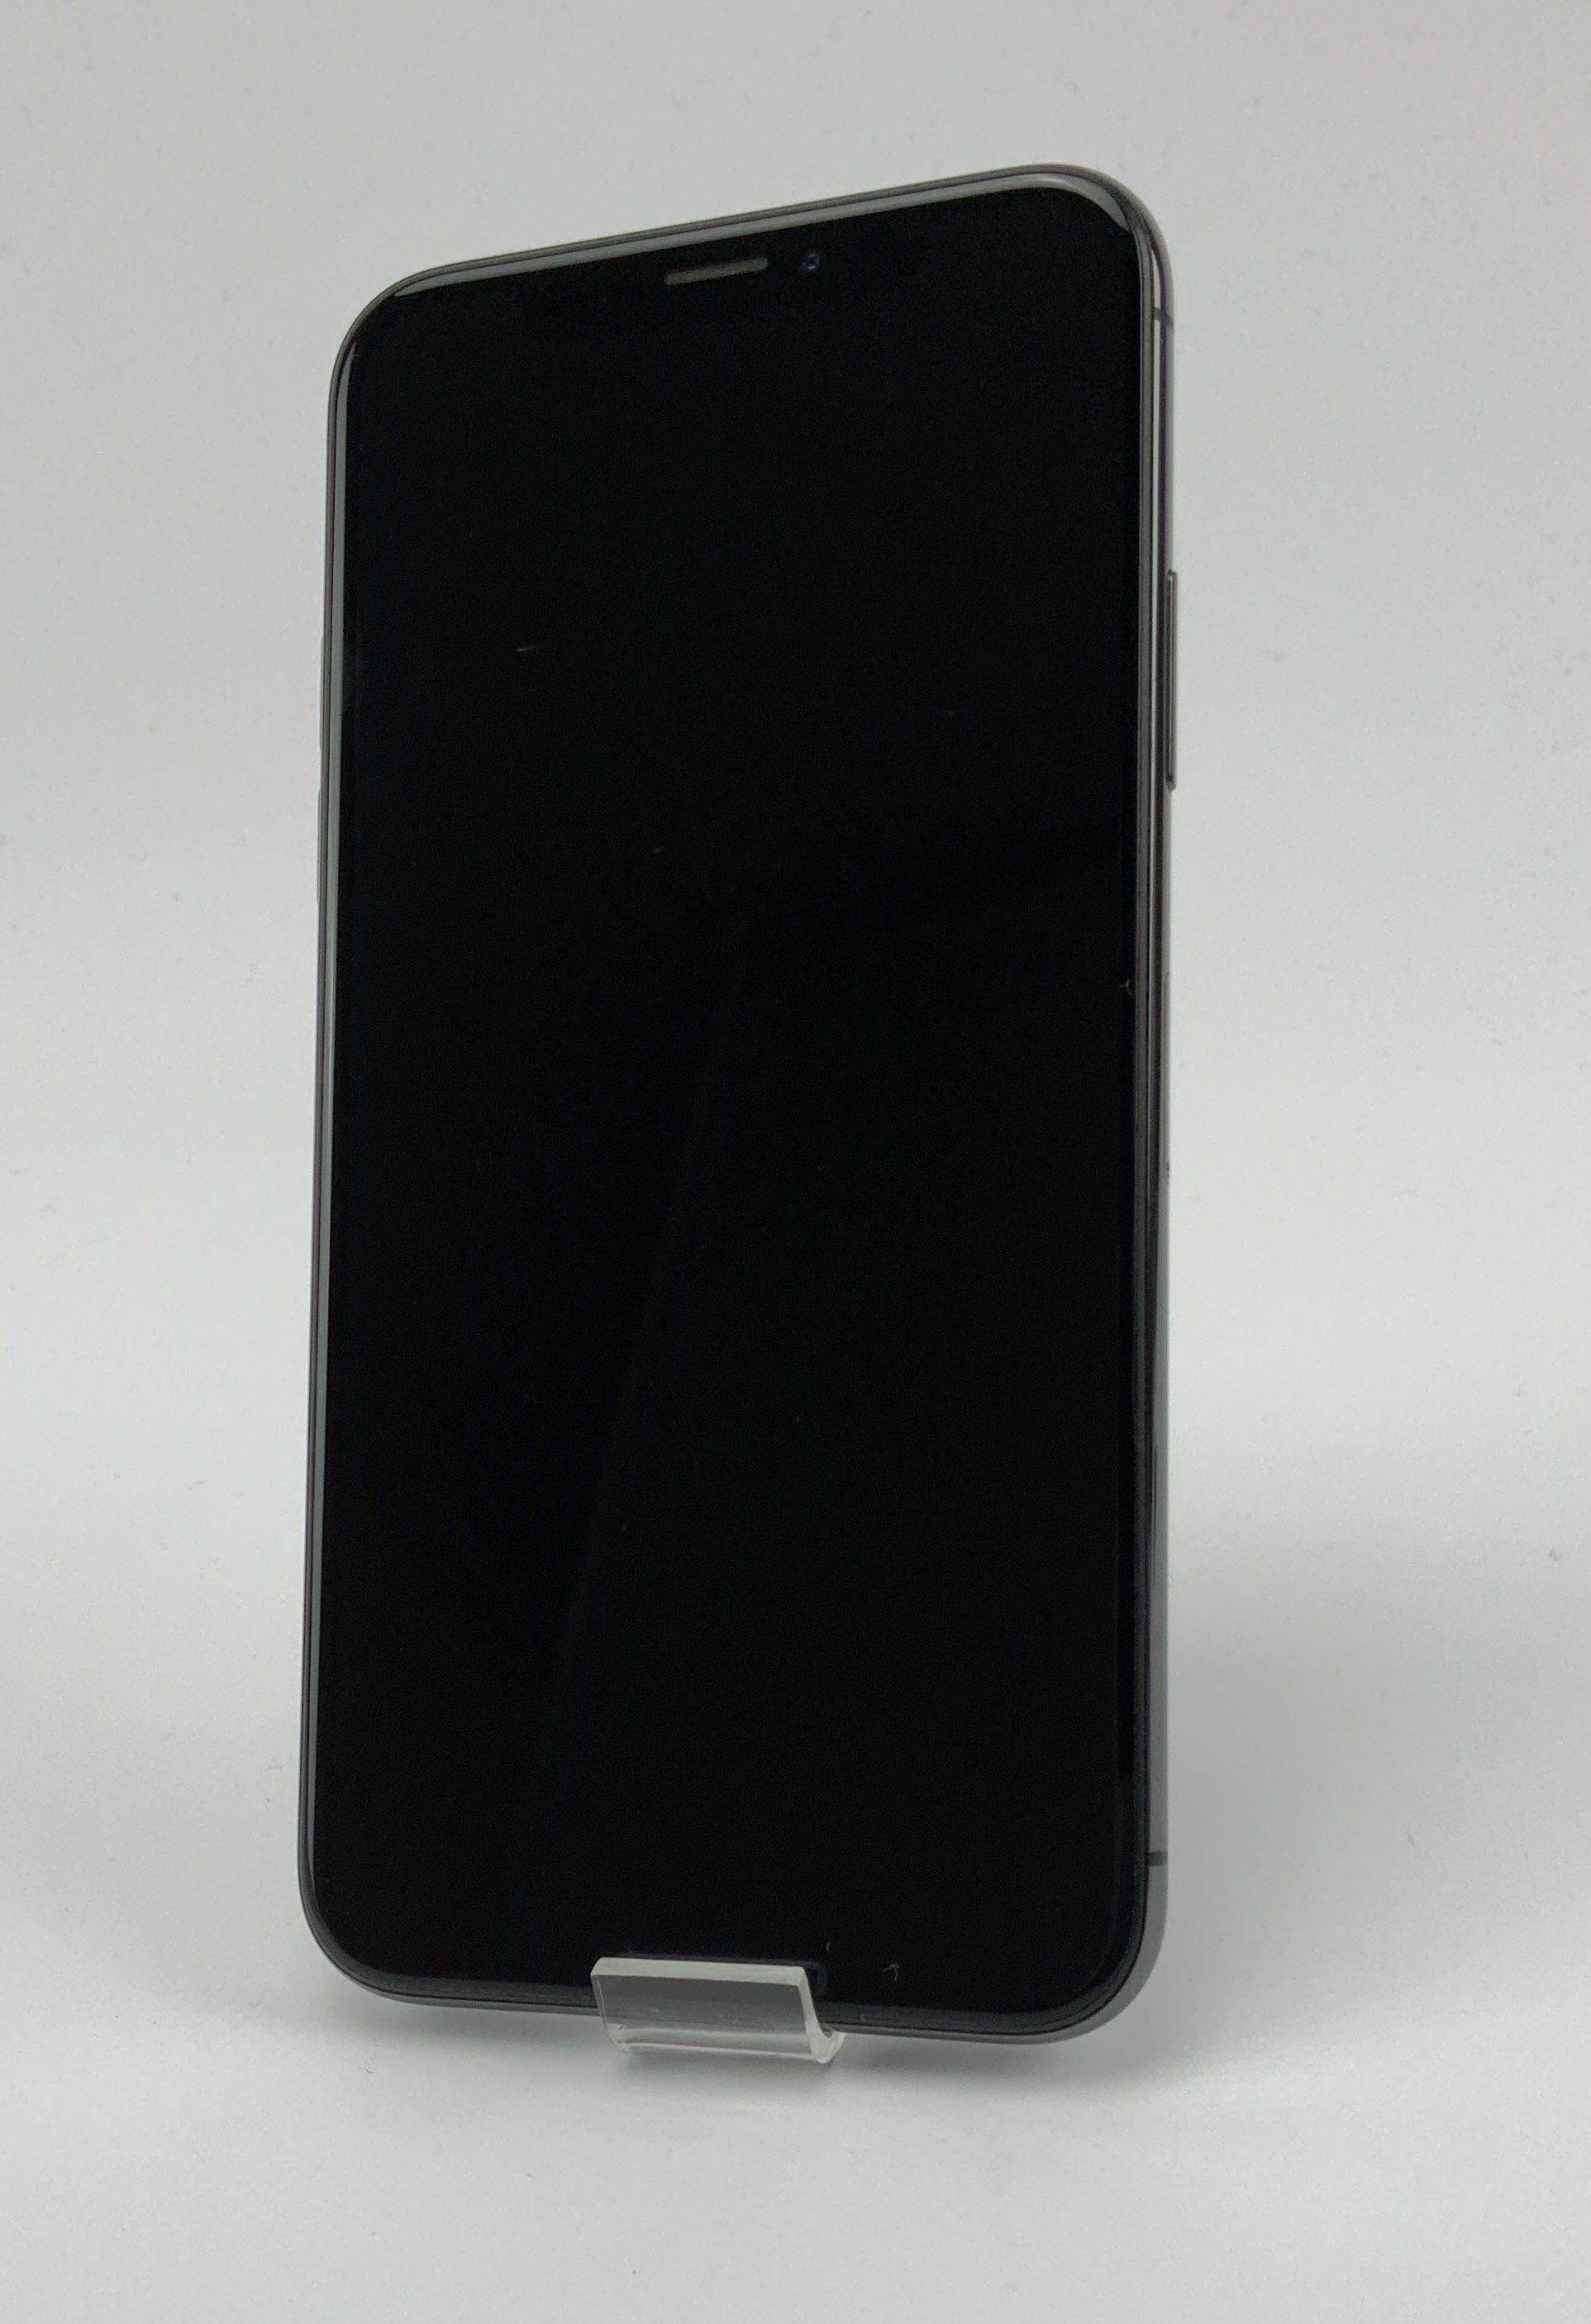 iPhone X 256GB, 256GB, Space Gray, imagen 1